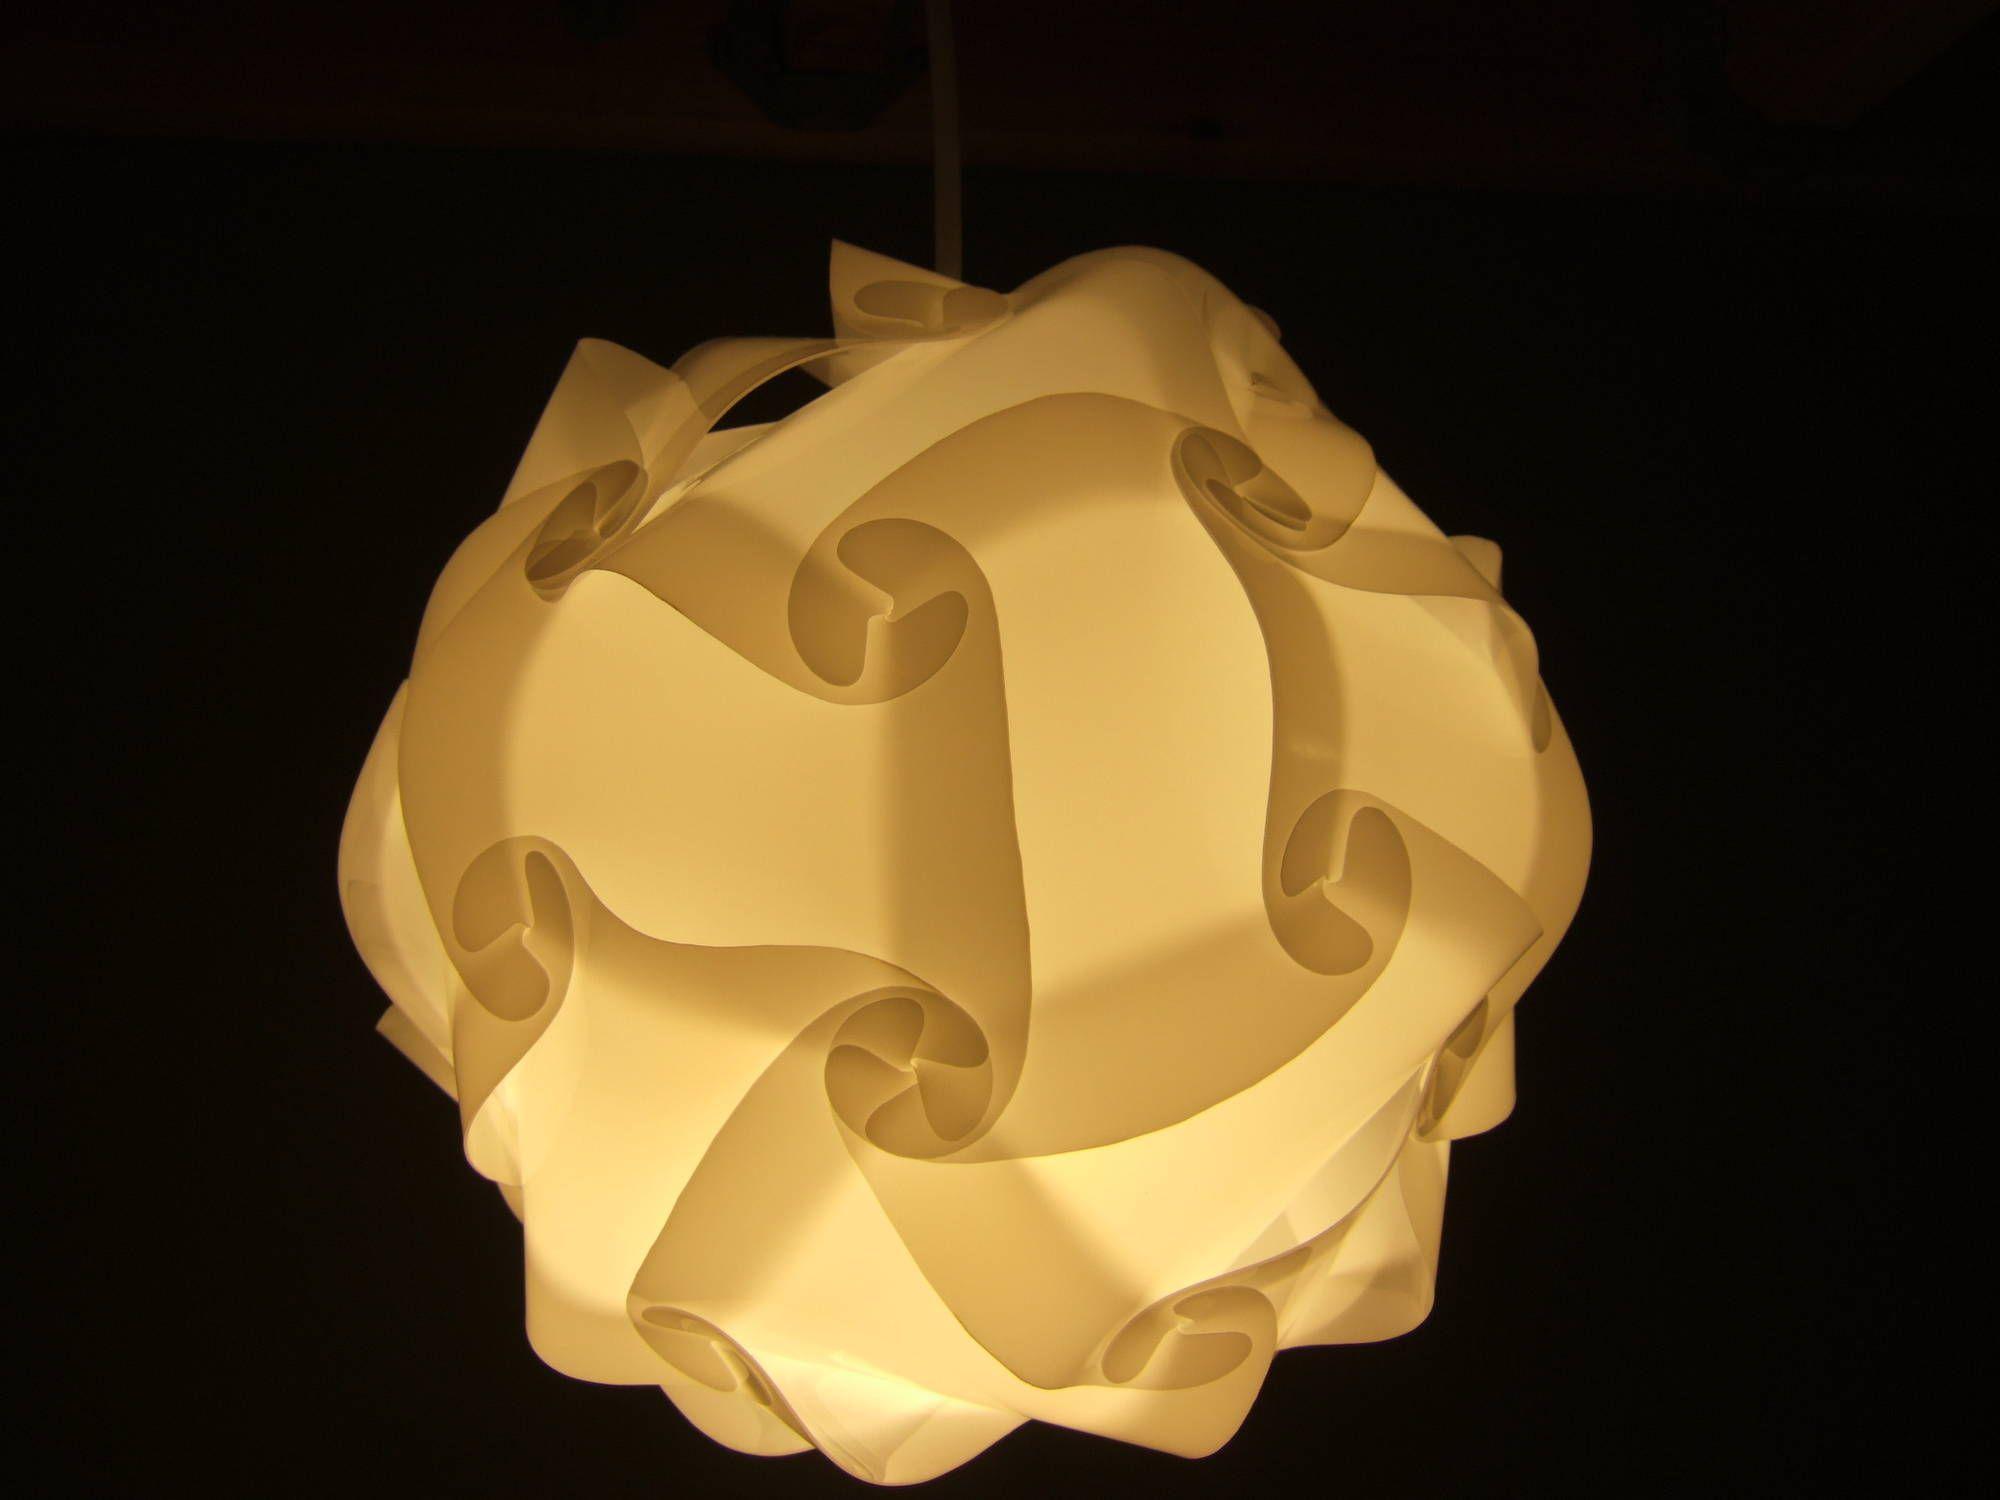 Universal Lamp Shade Polygon Building Kit Diy Lamp Shade Milk Jugs Diy Diy Lamp